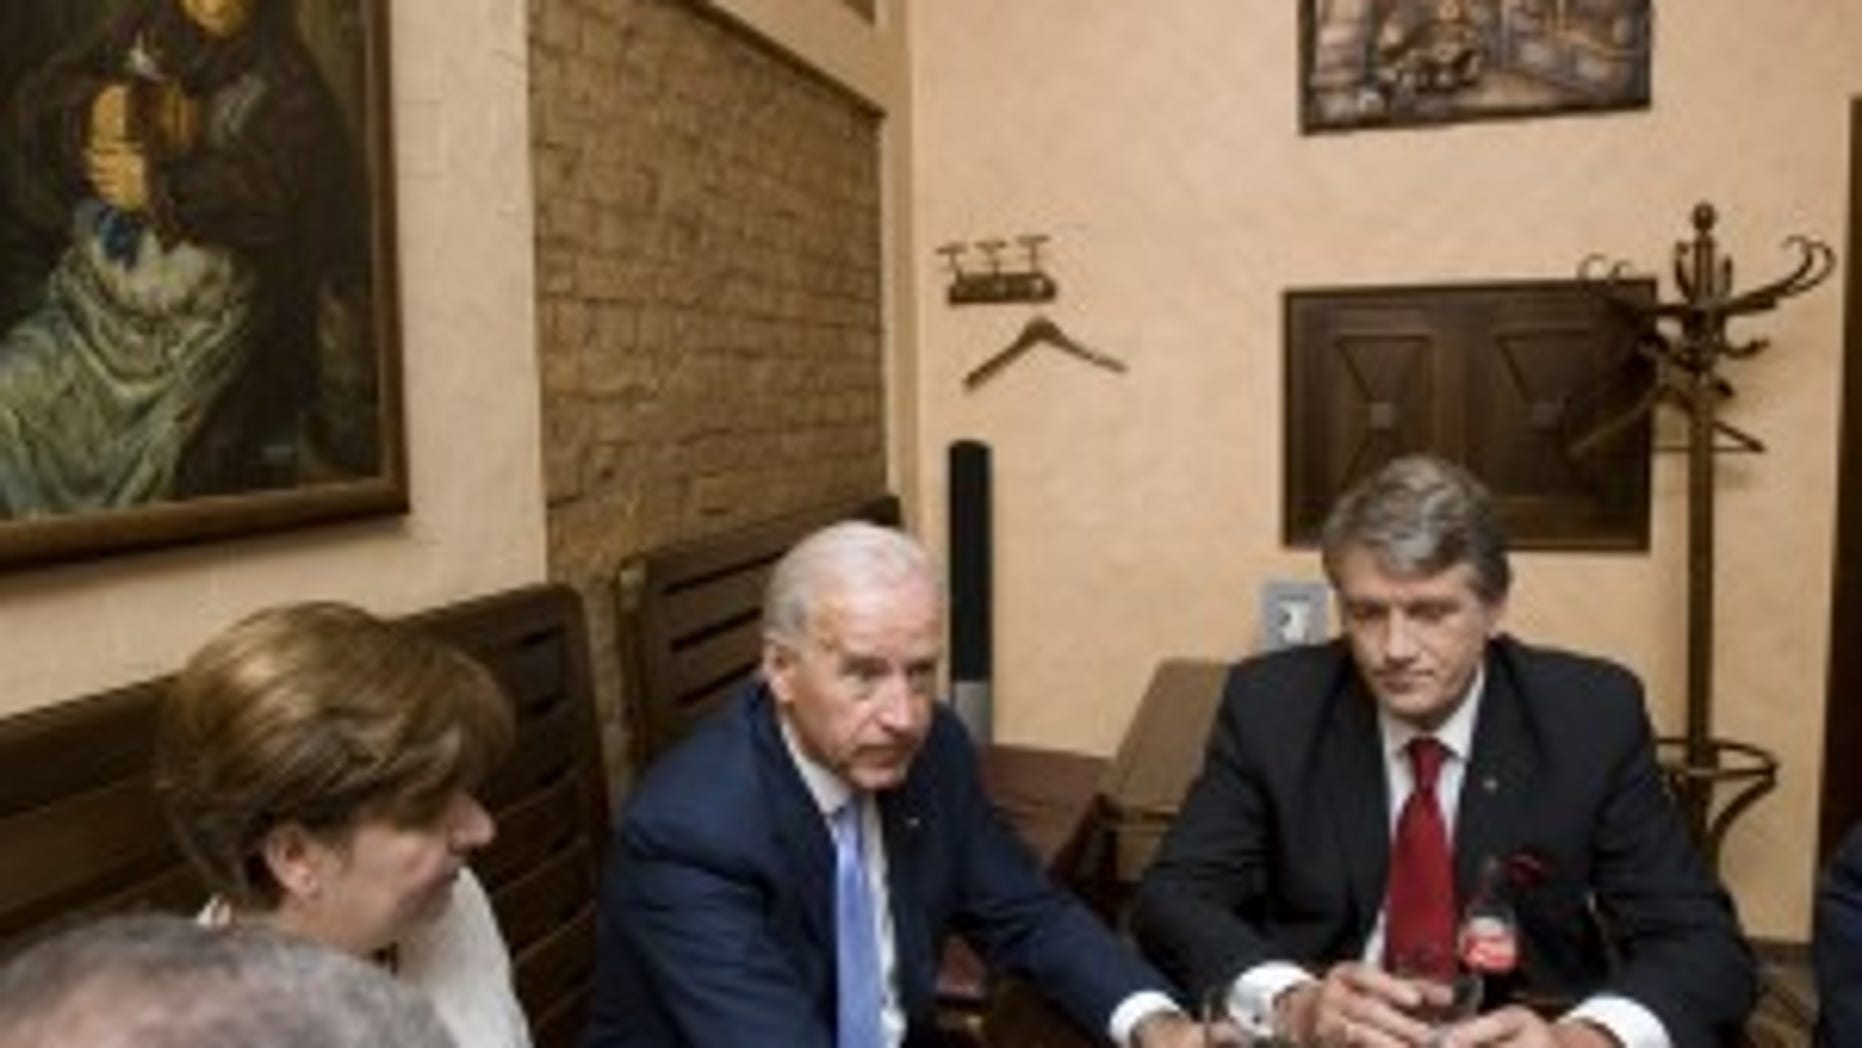 Ukrainian President Viktor Yushchenko, right, and U.S. Vice President Joe Biden speak at a pub in Kiev, Ukraine, Tuesday, July 21, 2009. Biden arrived in Ukraine for a three-day working visit. (AP Photo/Mykhailo Markiv)